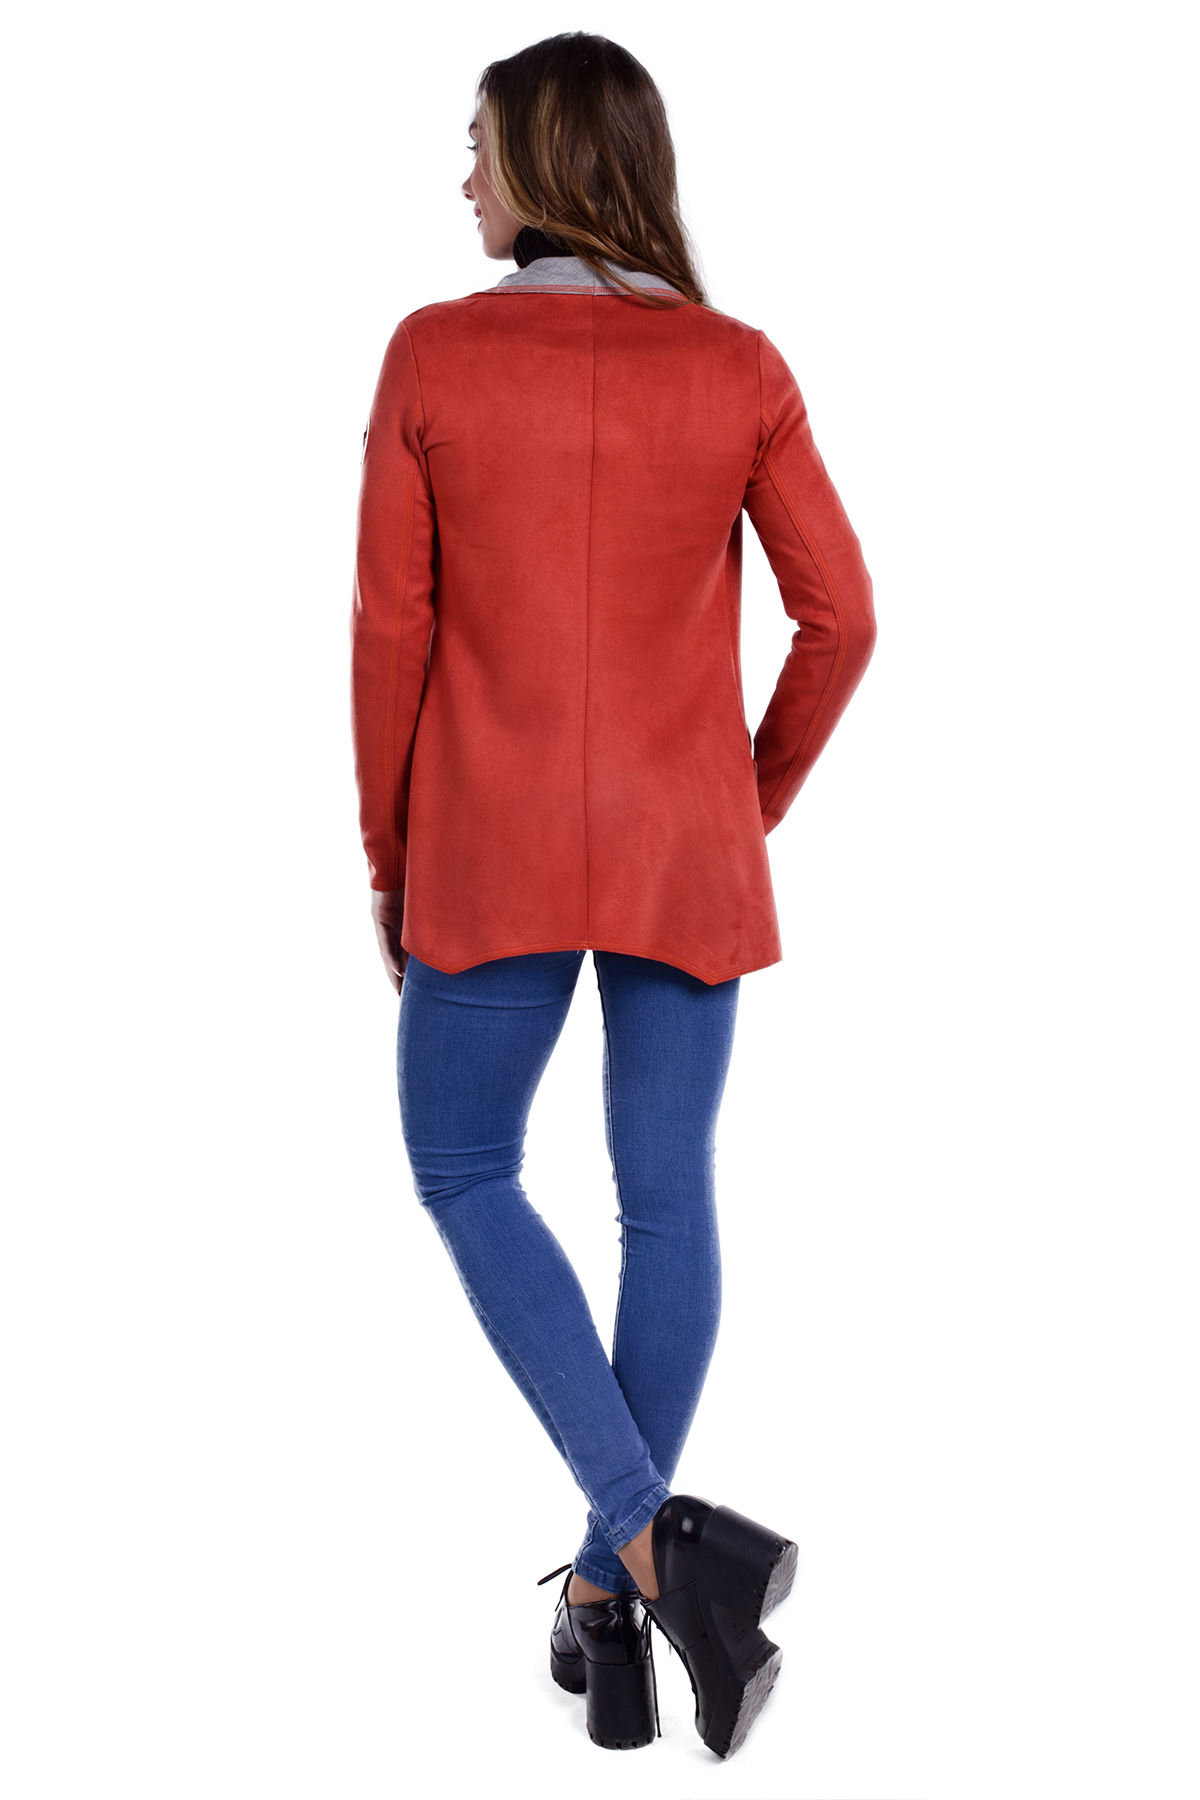 Одежда селин интернет магазин